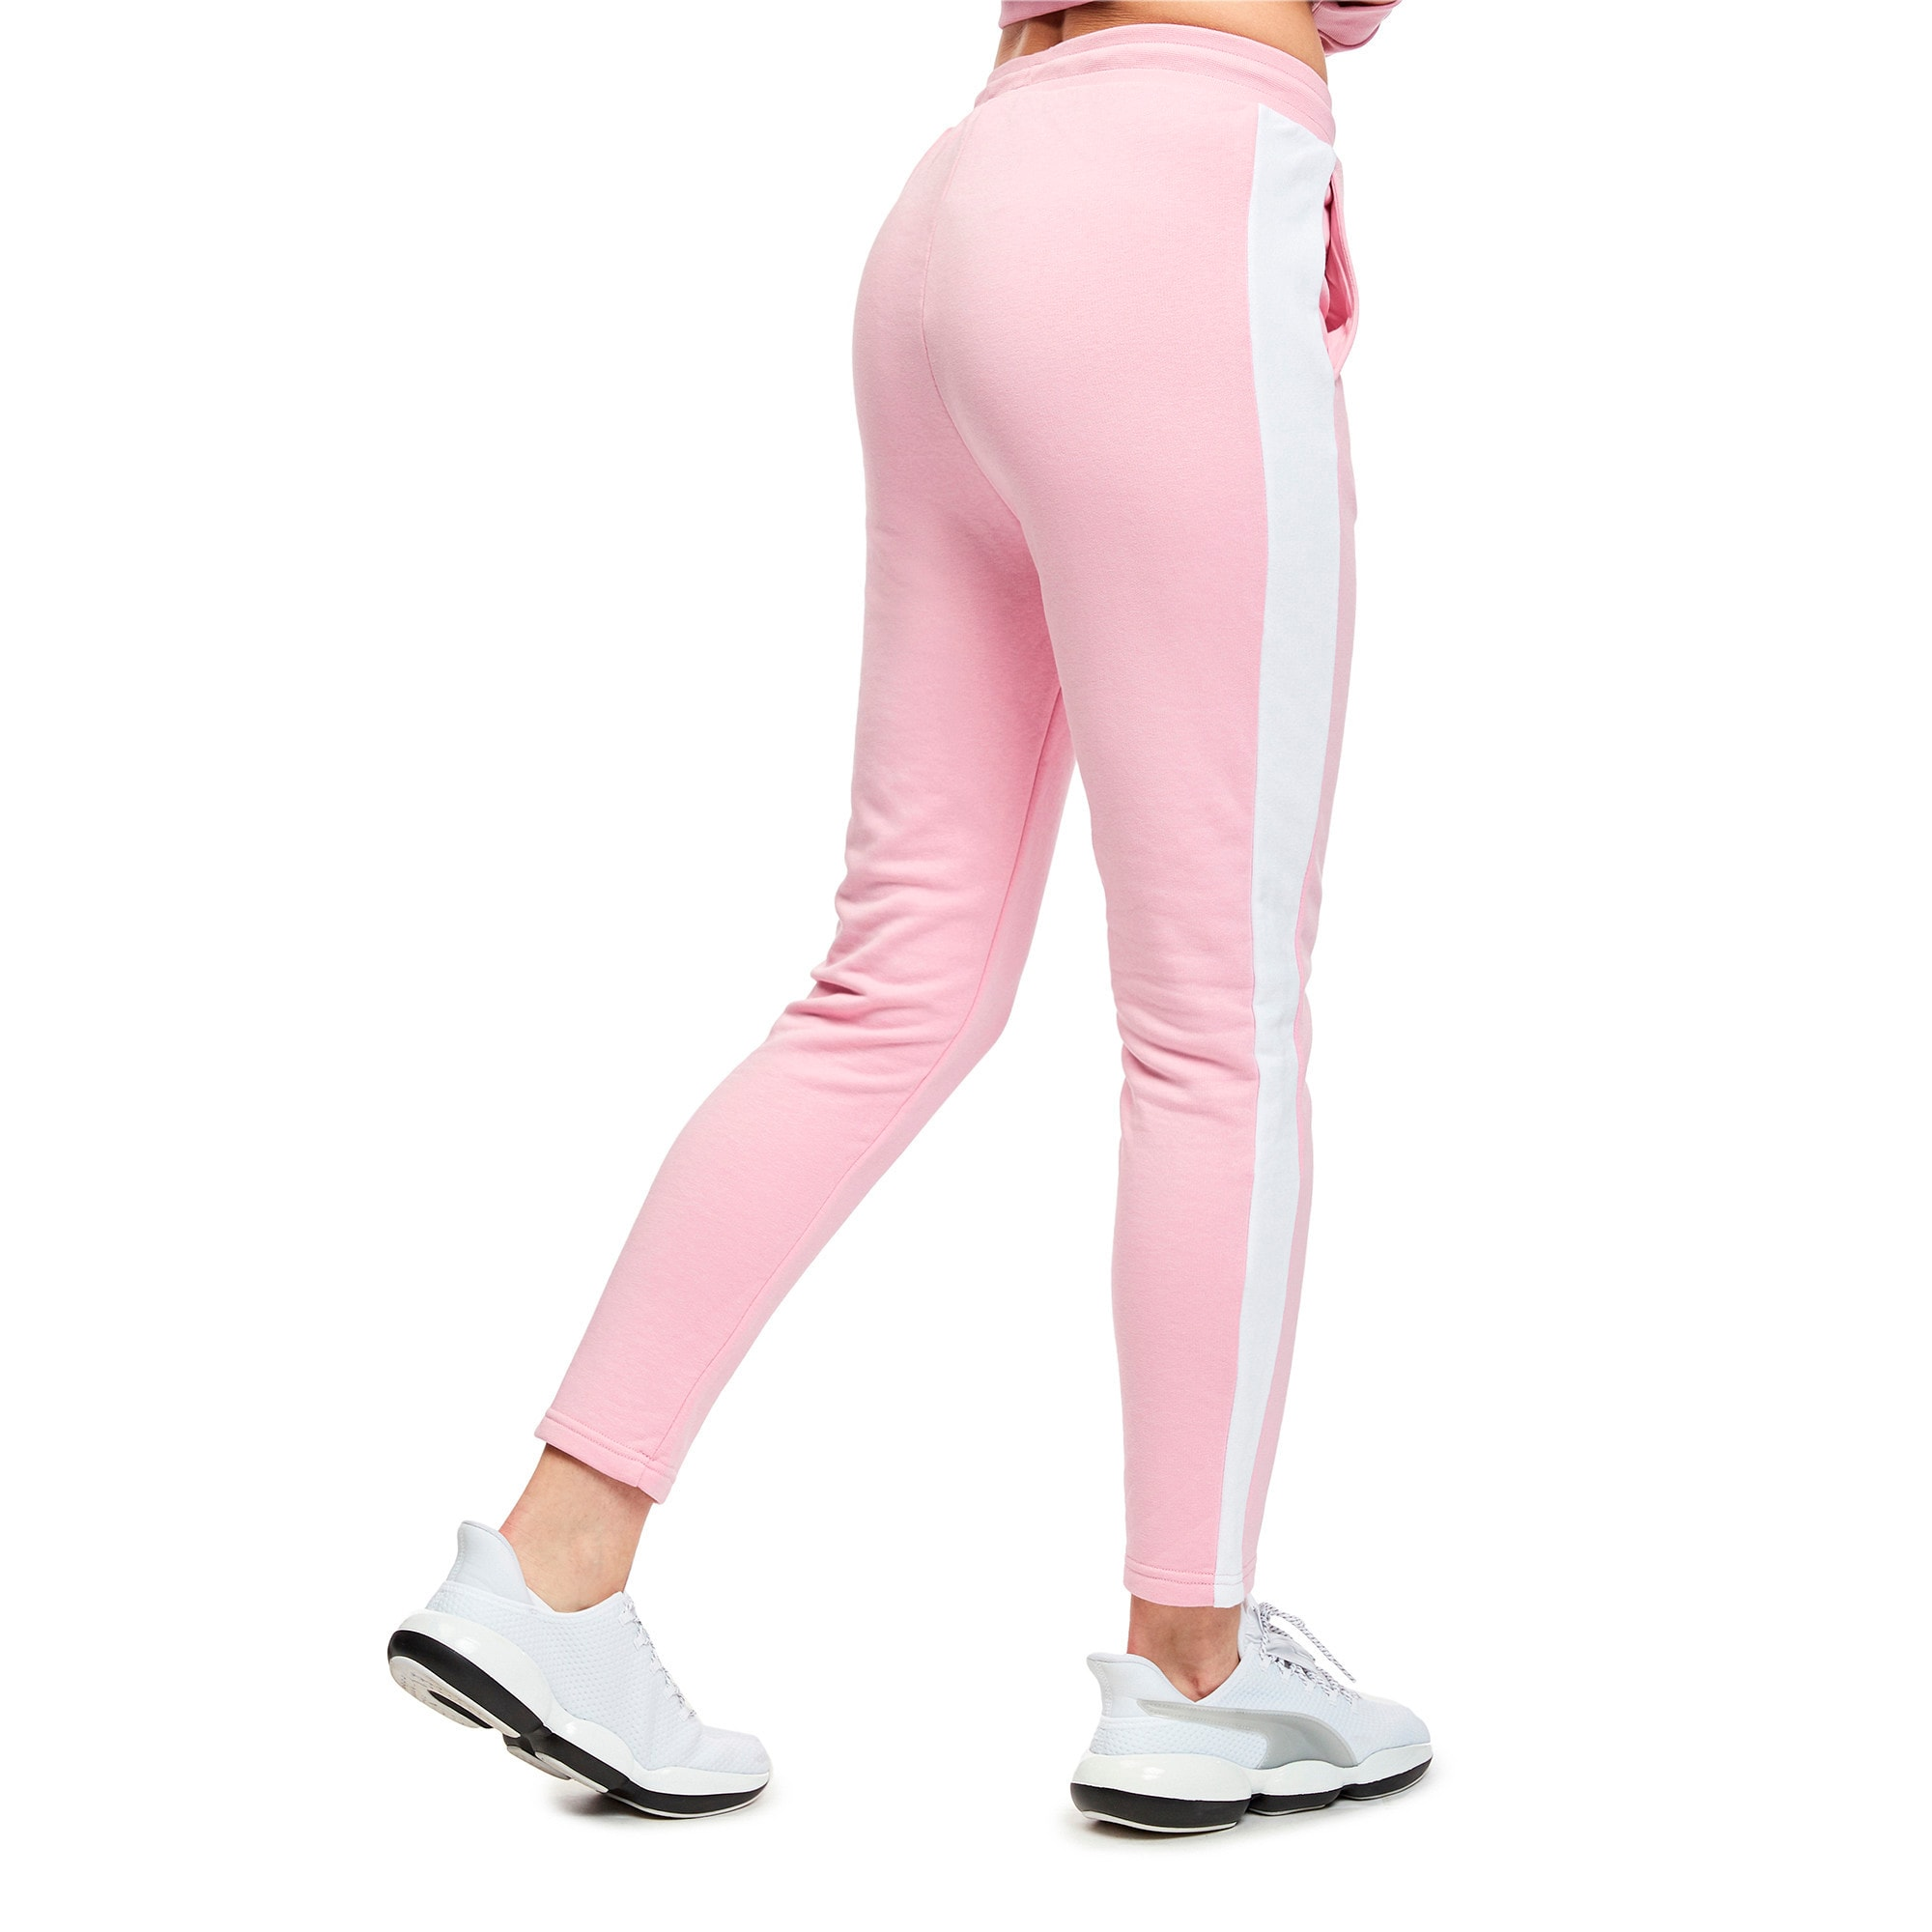 Thumbnail 3 of Classics T7 Women's Track Pants, Pale Pink, medium-IND